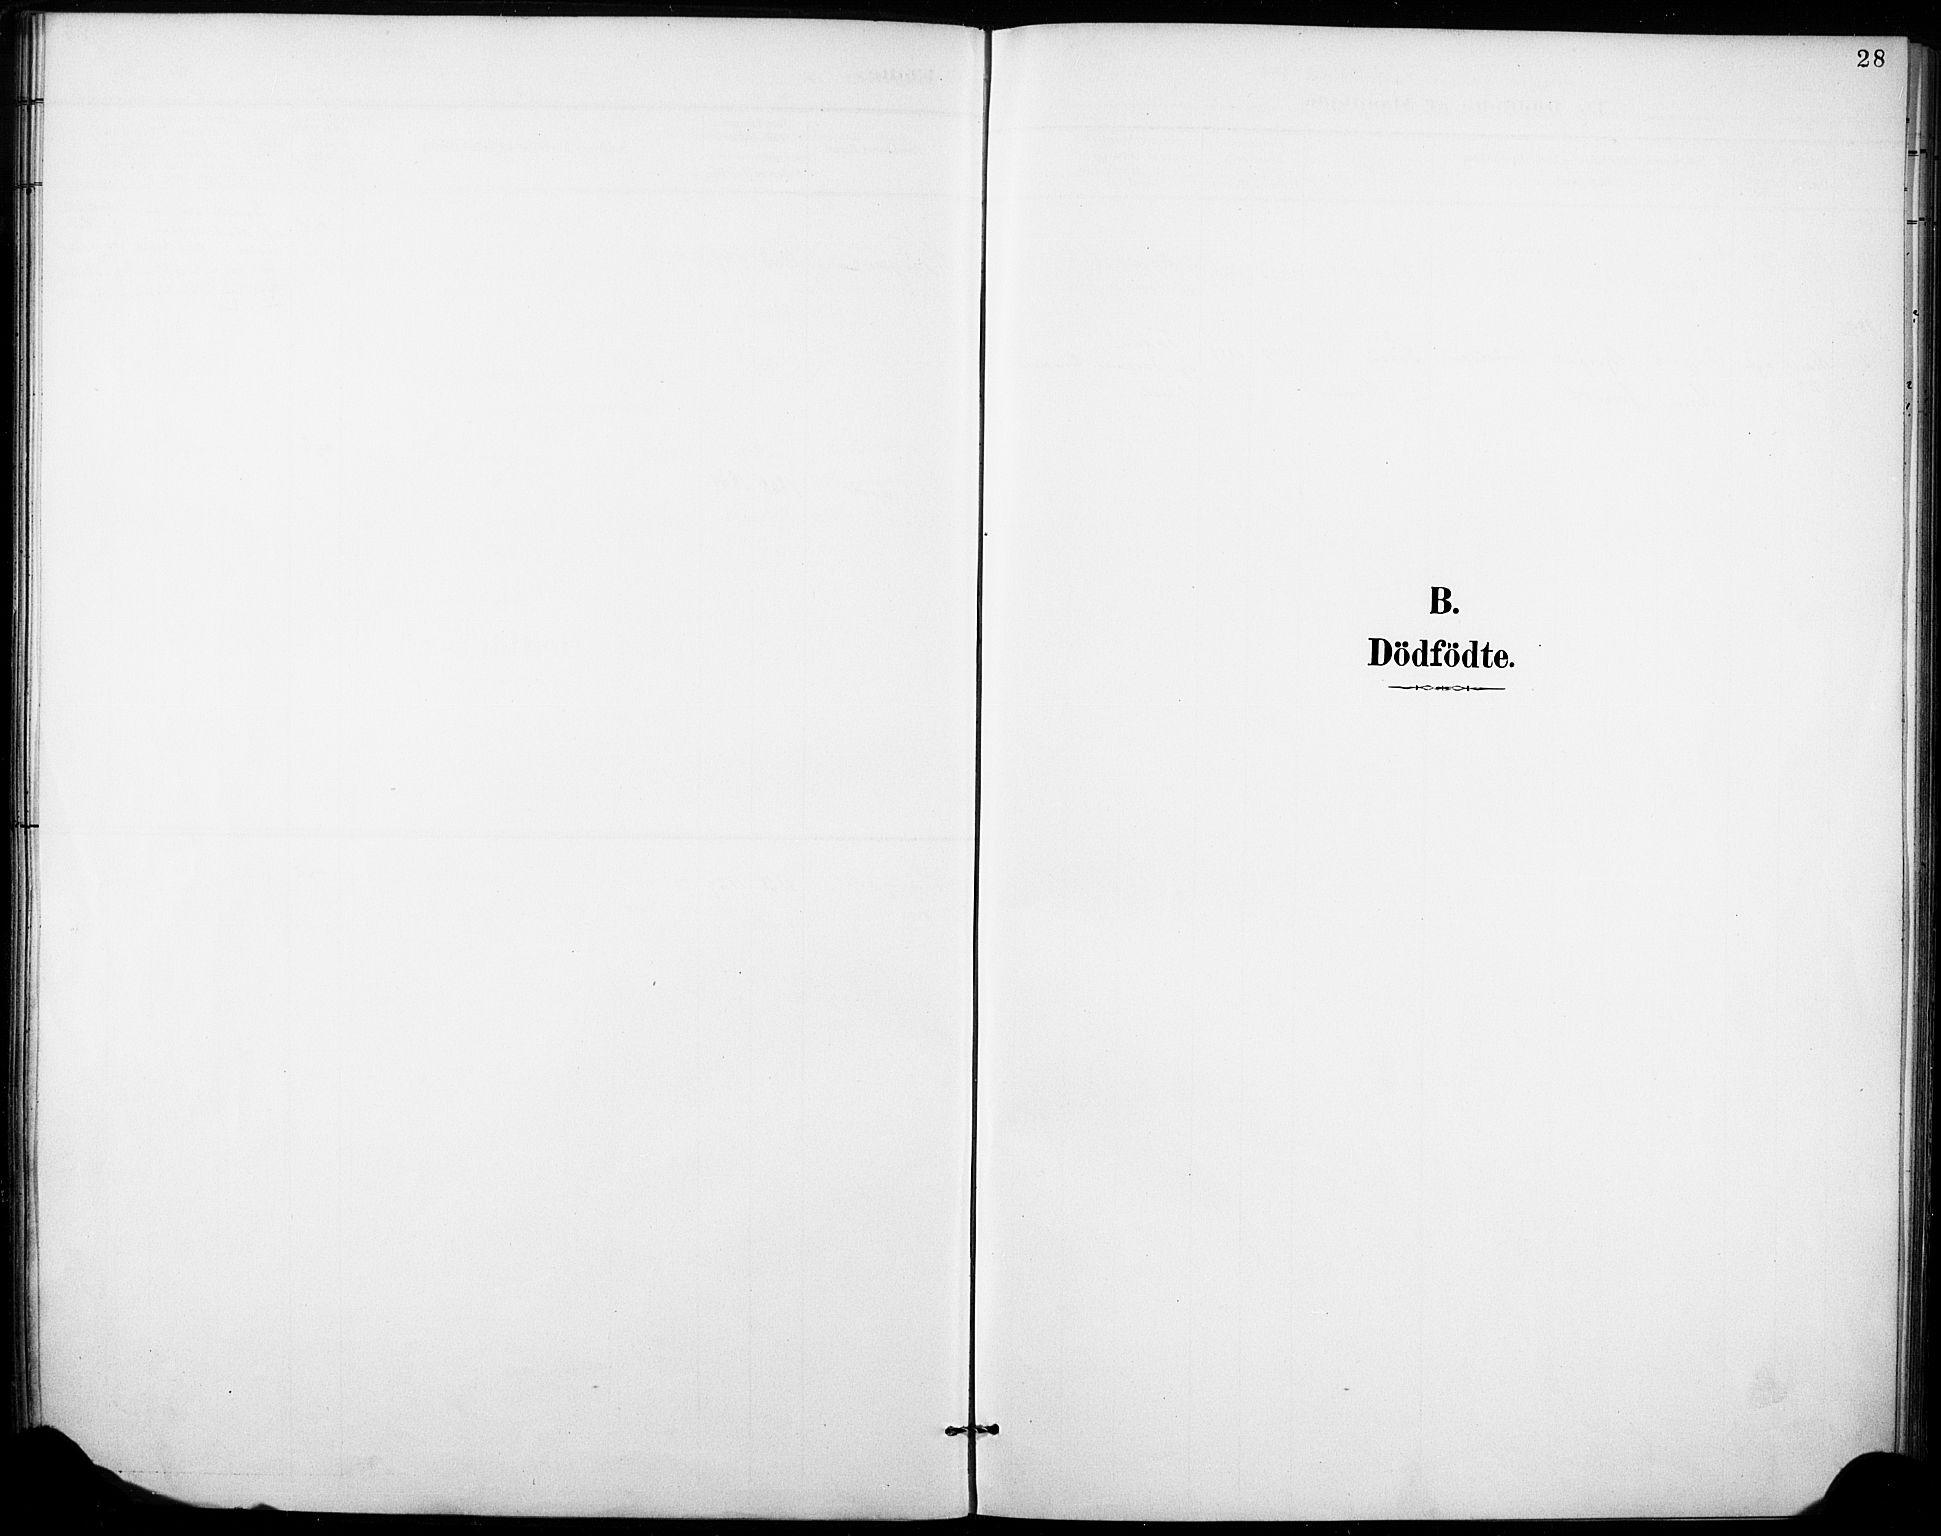 SAKO, Fyresdal kirkebøker, F/Fb/L0003: Ministerialbok nr. II 3, 1887-1903, s. 28